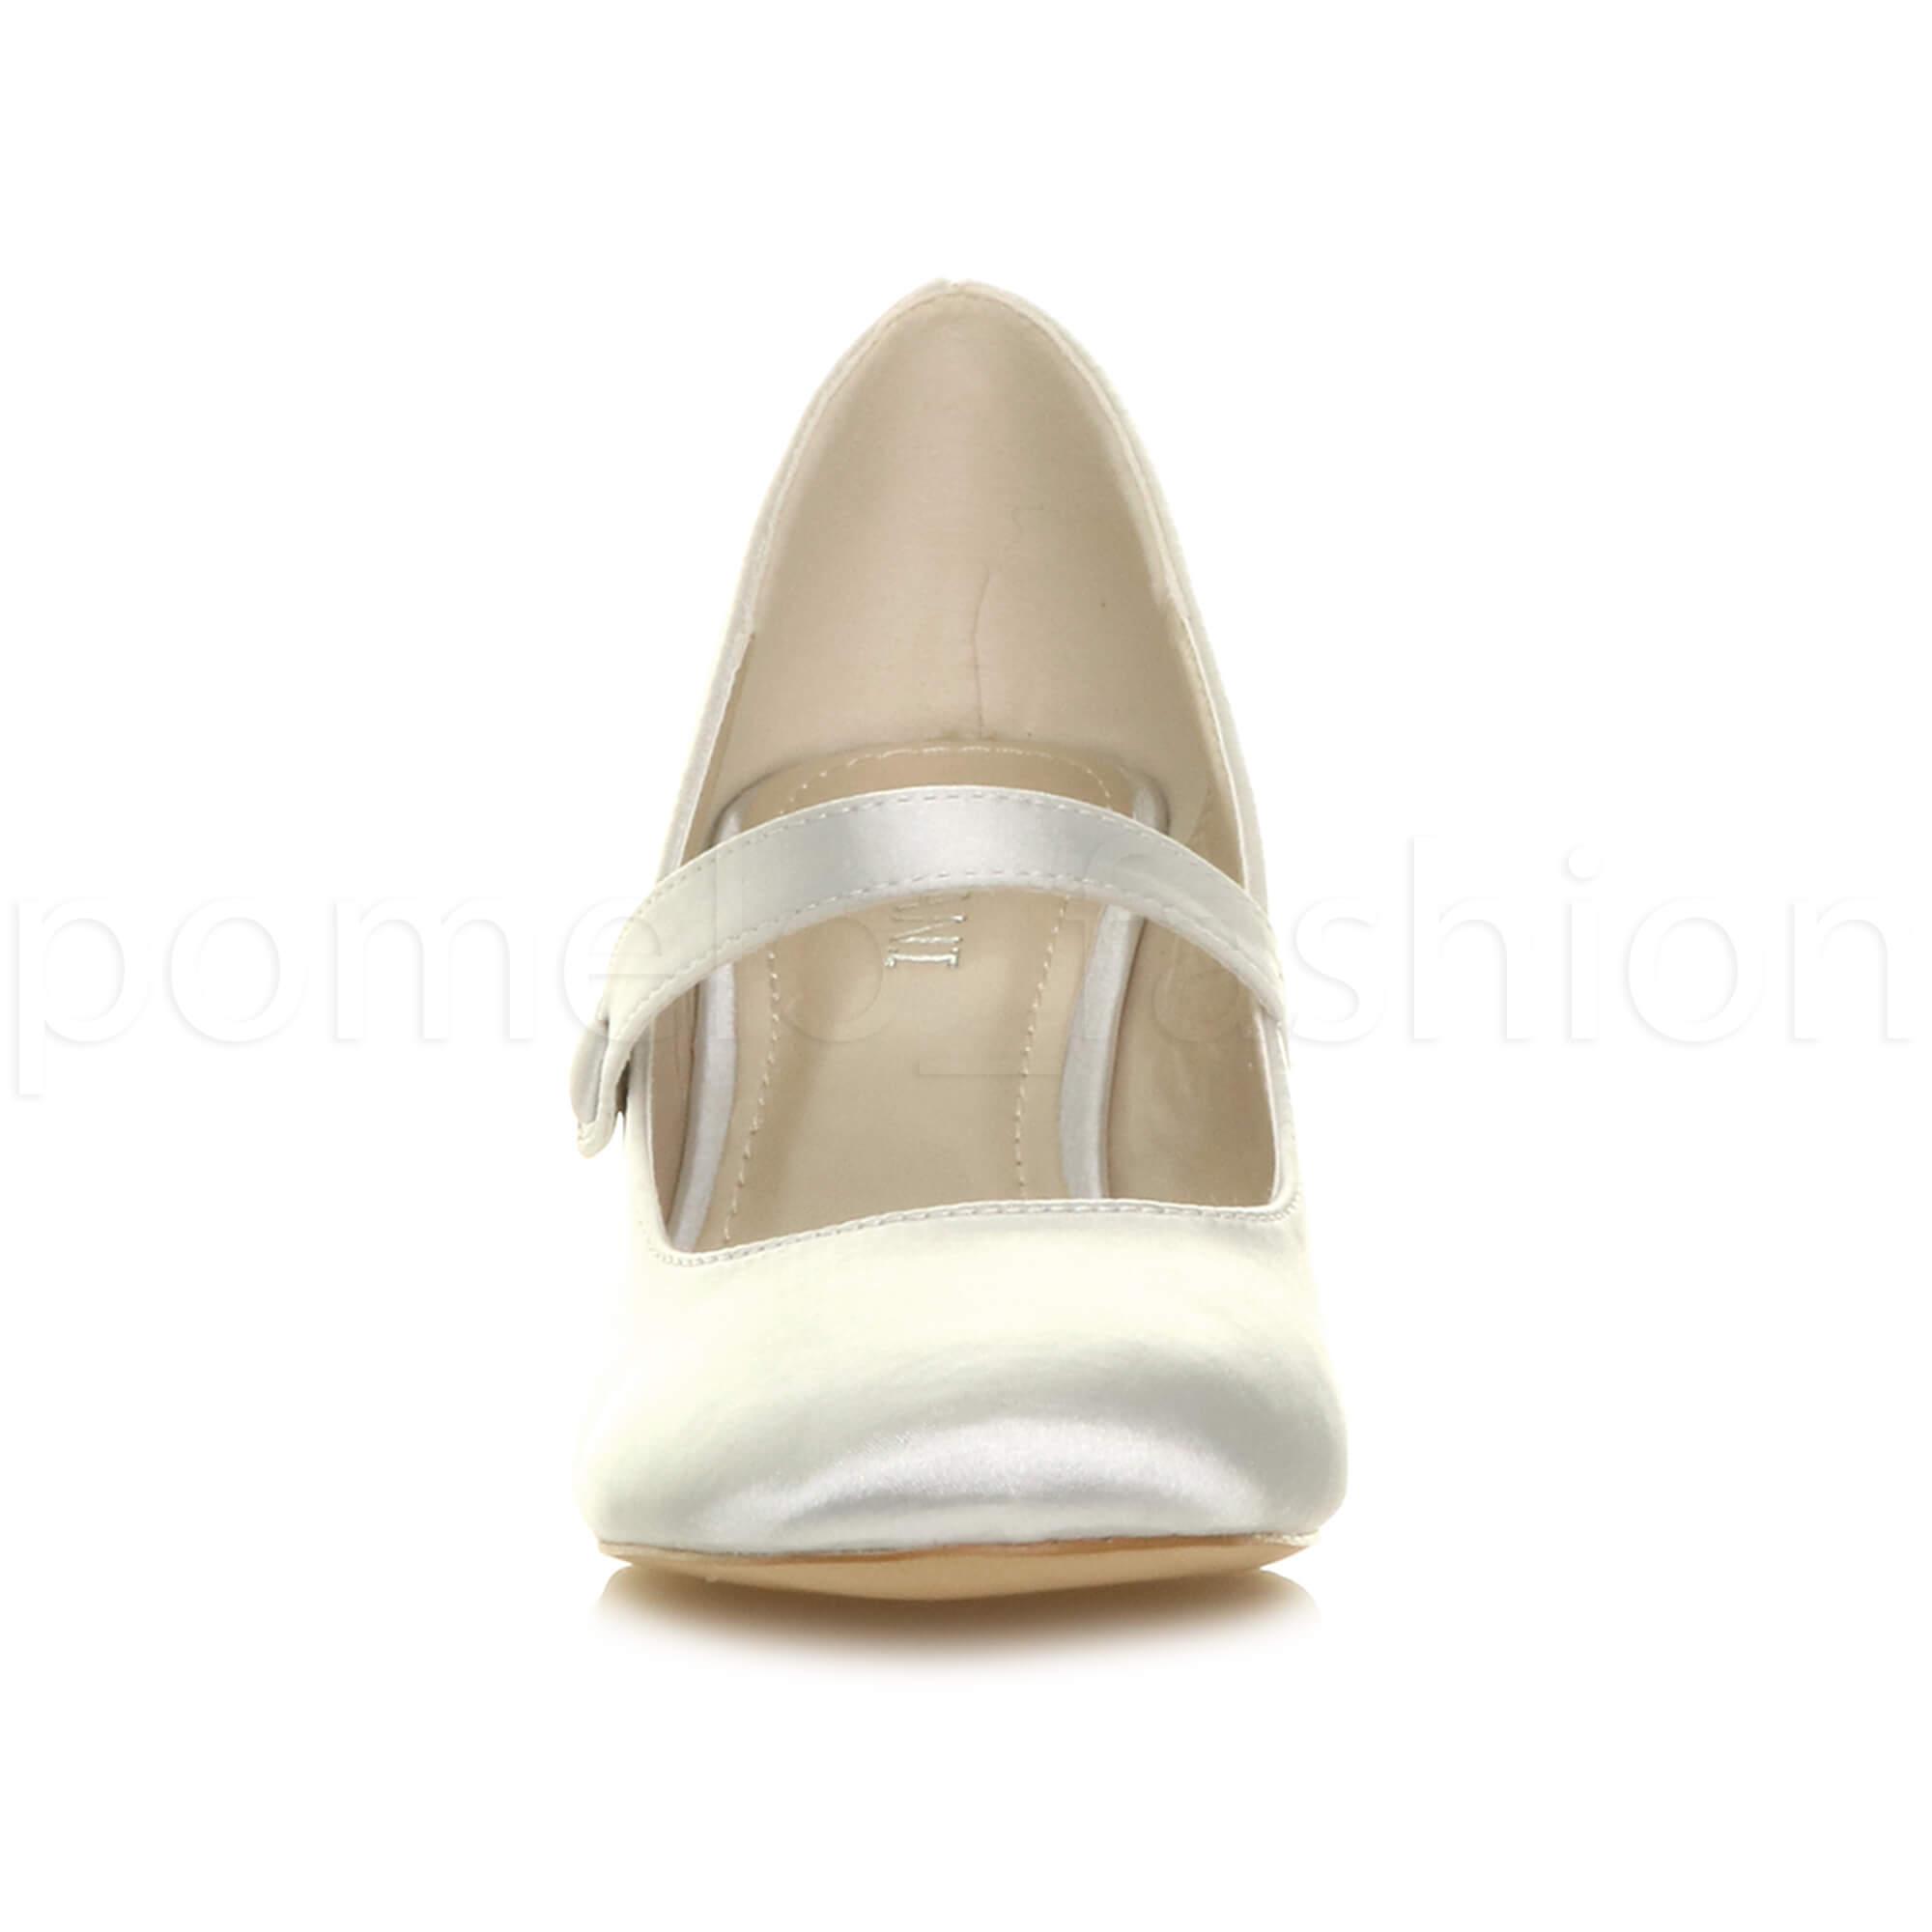 miniatura 160 - Donna basso tacco medio Mary Jane Damigella Matrimonio Pompe Scarpe Da Sera Taglia